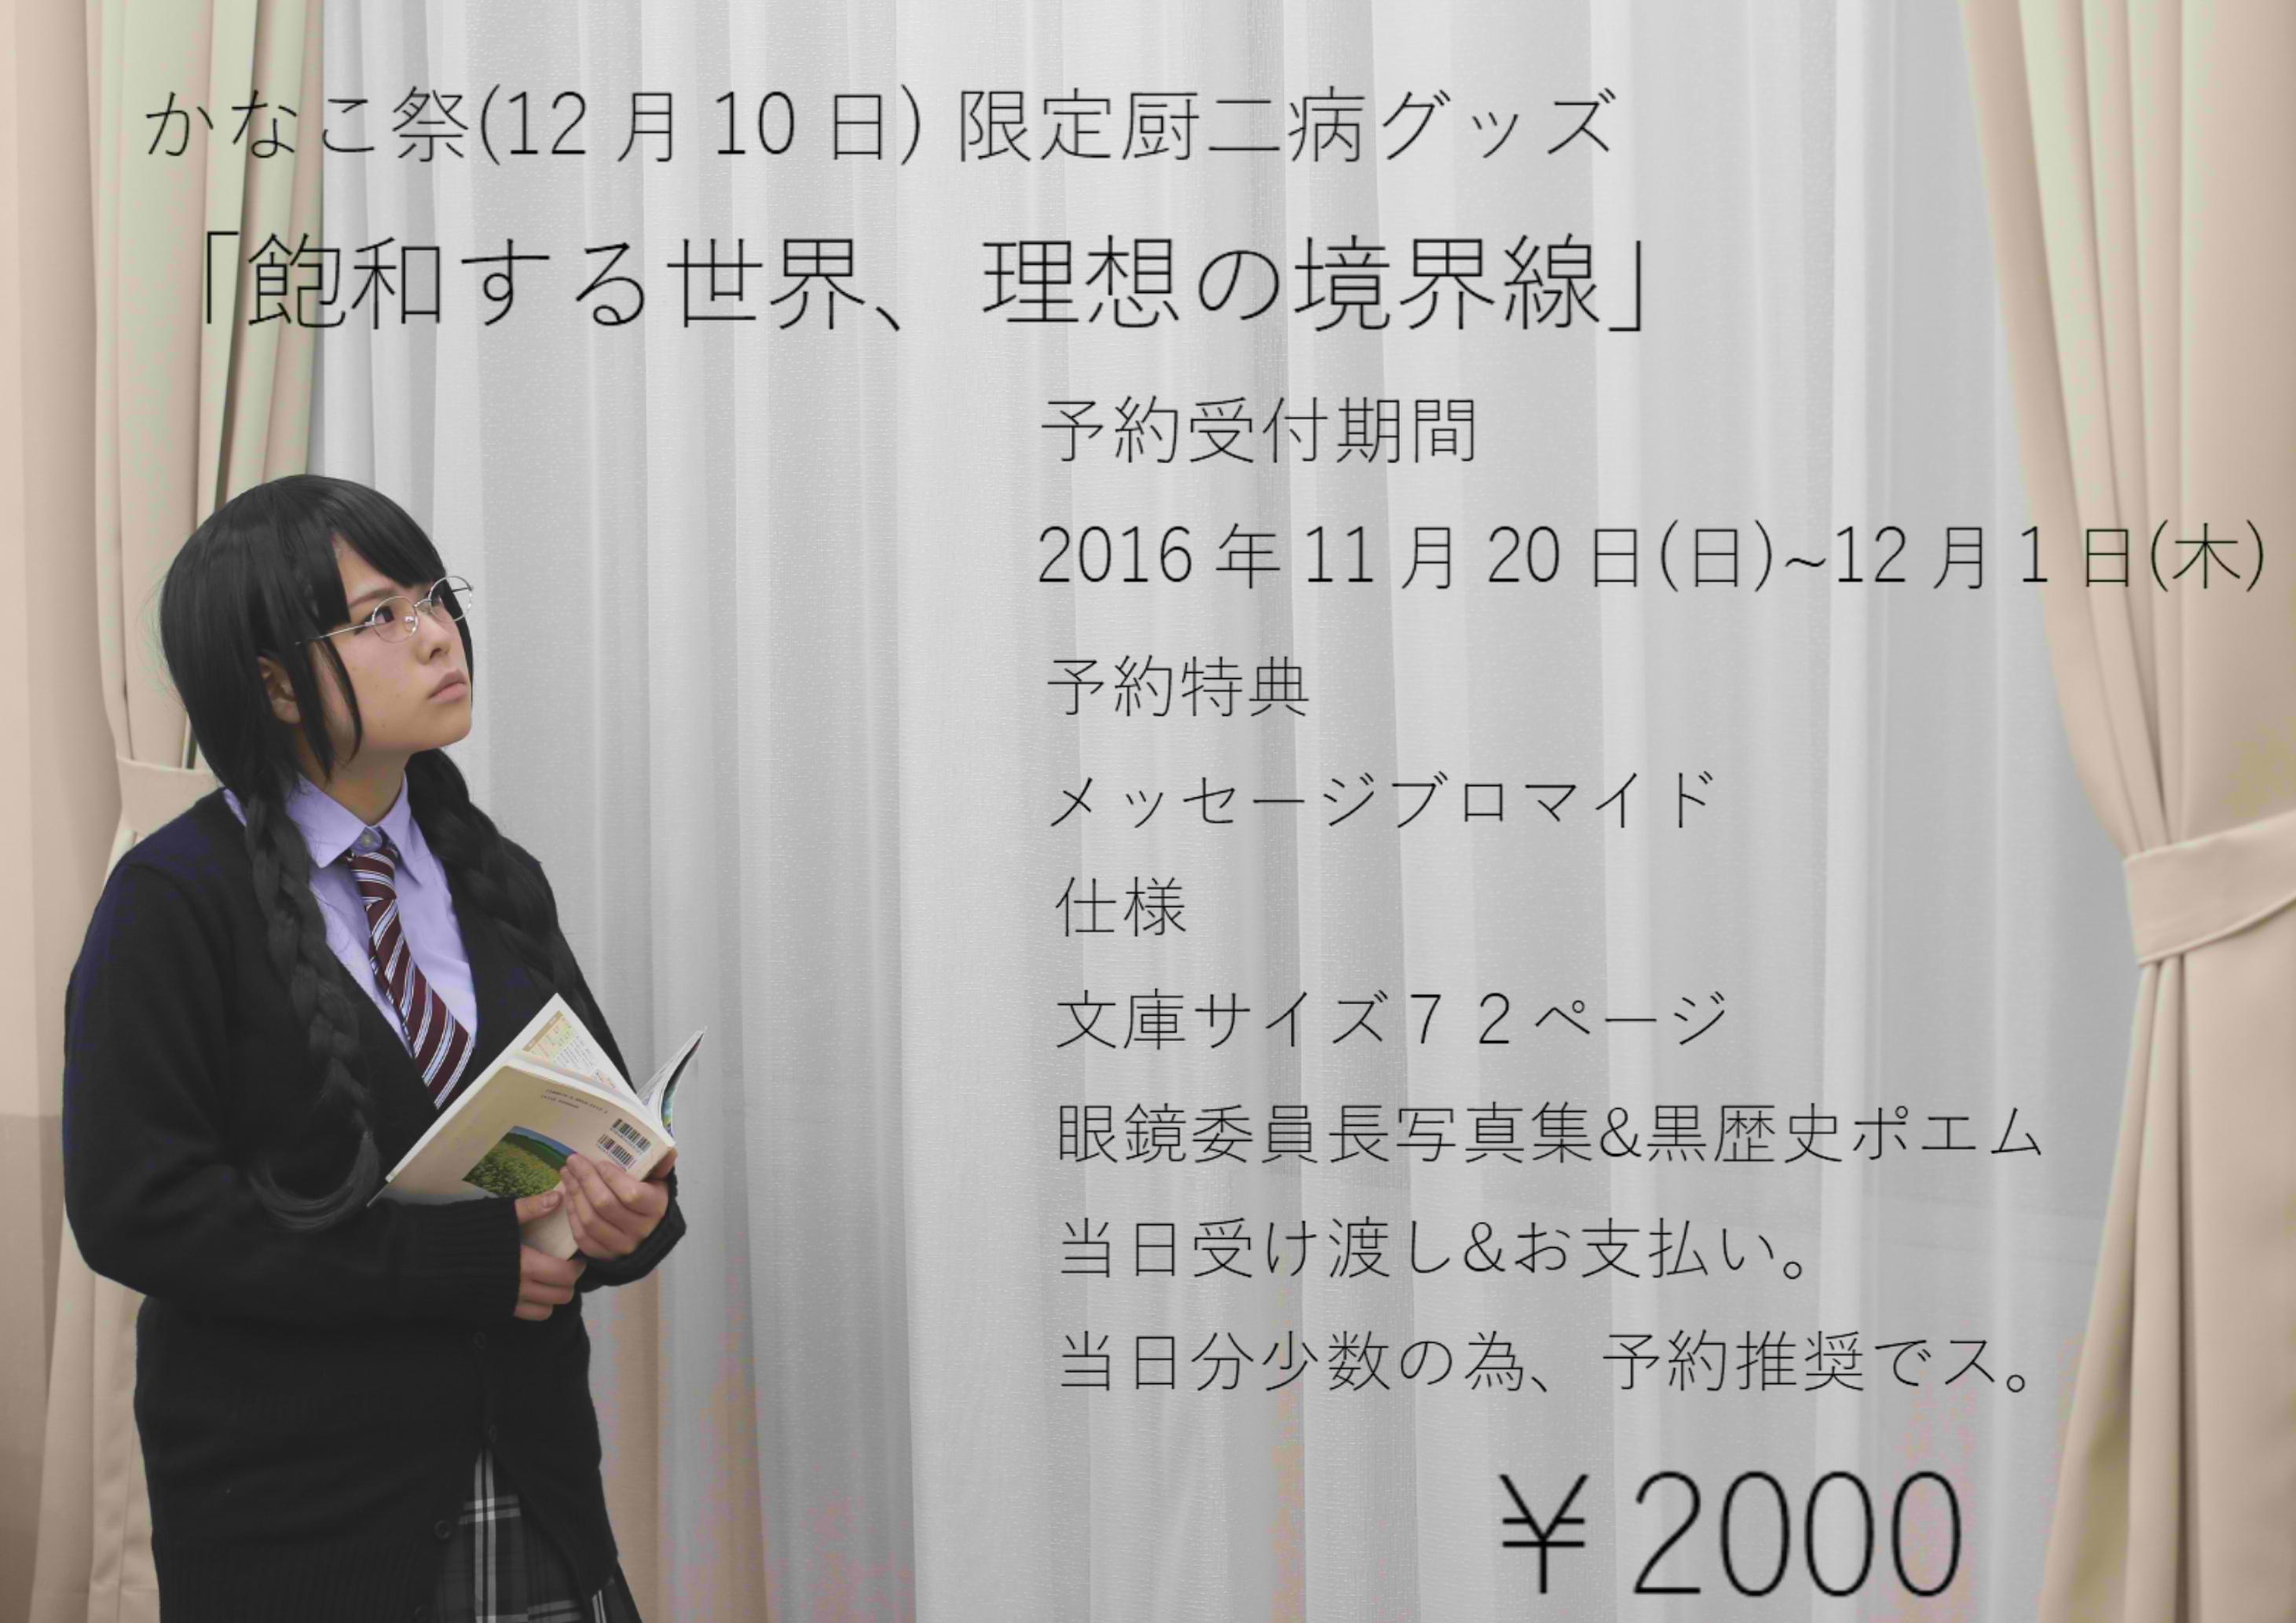 201611210237451a5.jpg